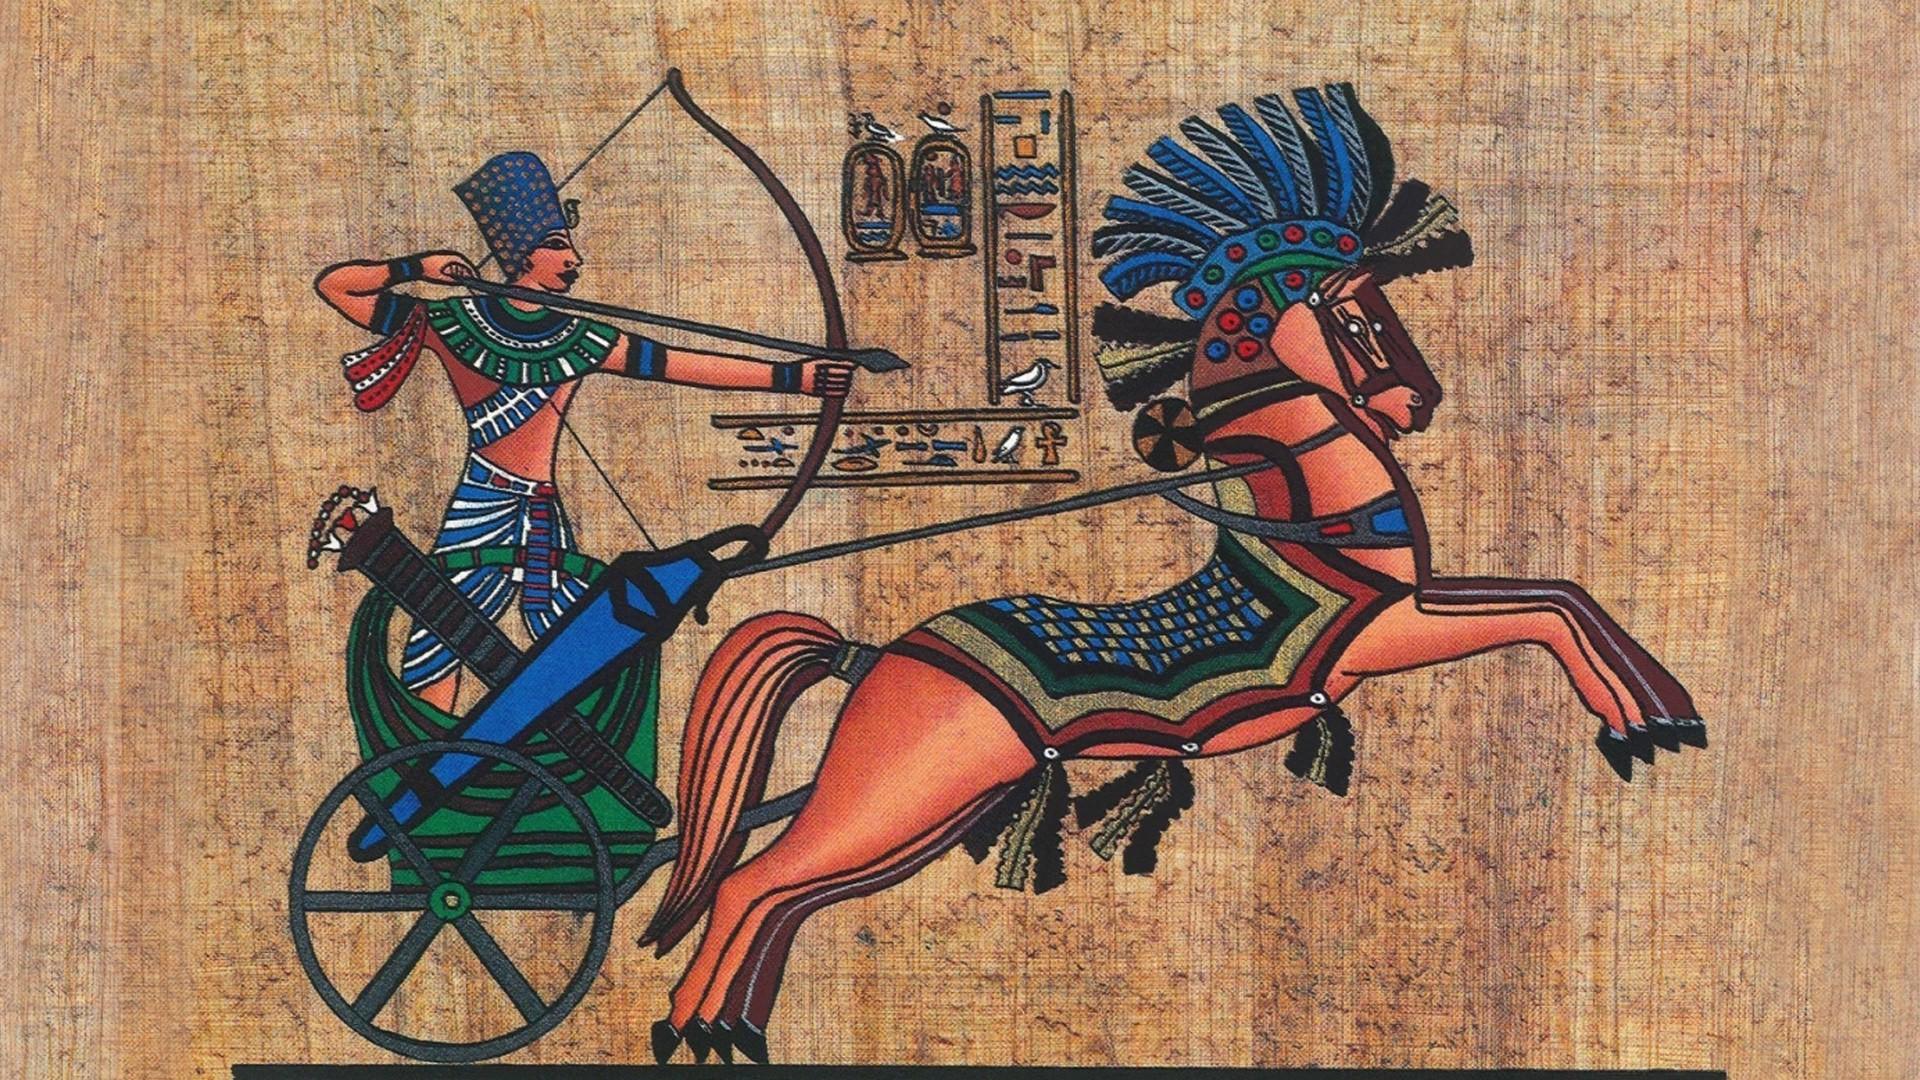 archer, Pharaoh, Men, Animals, Horse, Egypt, Ancient, Hieroglyphics, Bow,  Arrows, Texture, Papyrus Wallpapers HD / Desktop and Mobile Backgrounds